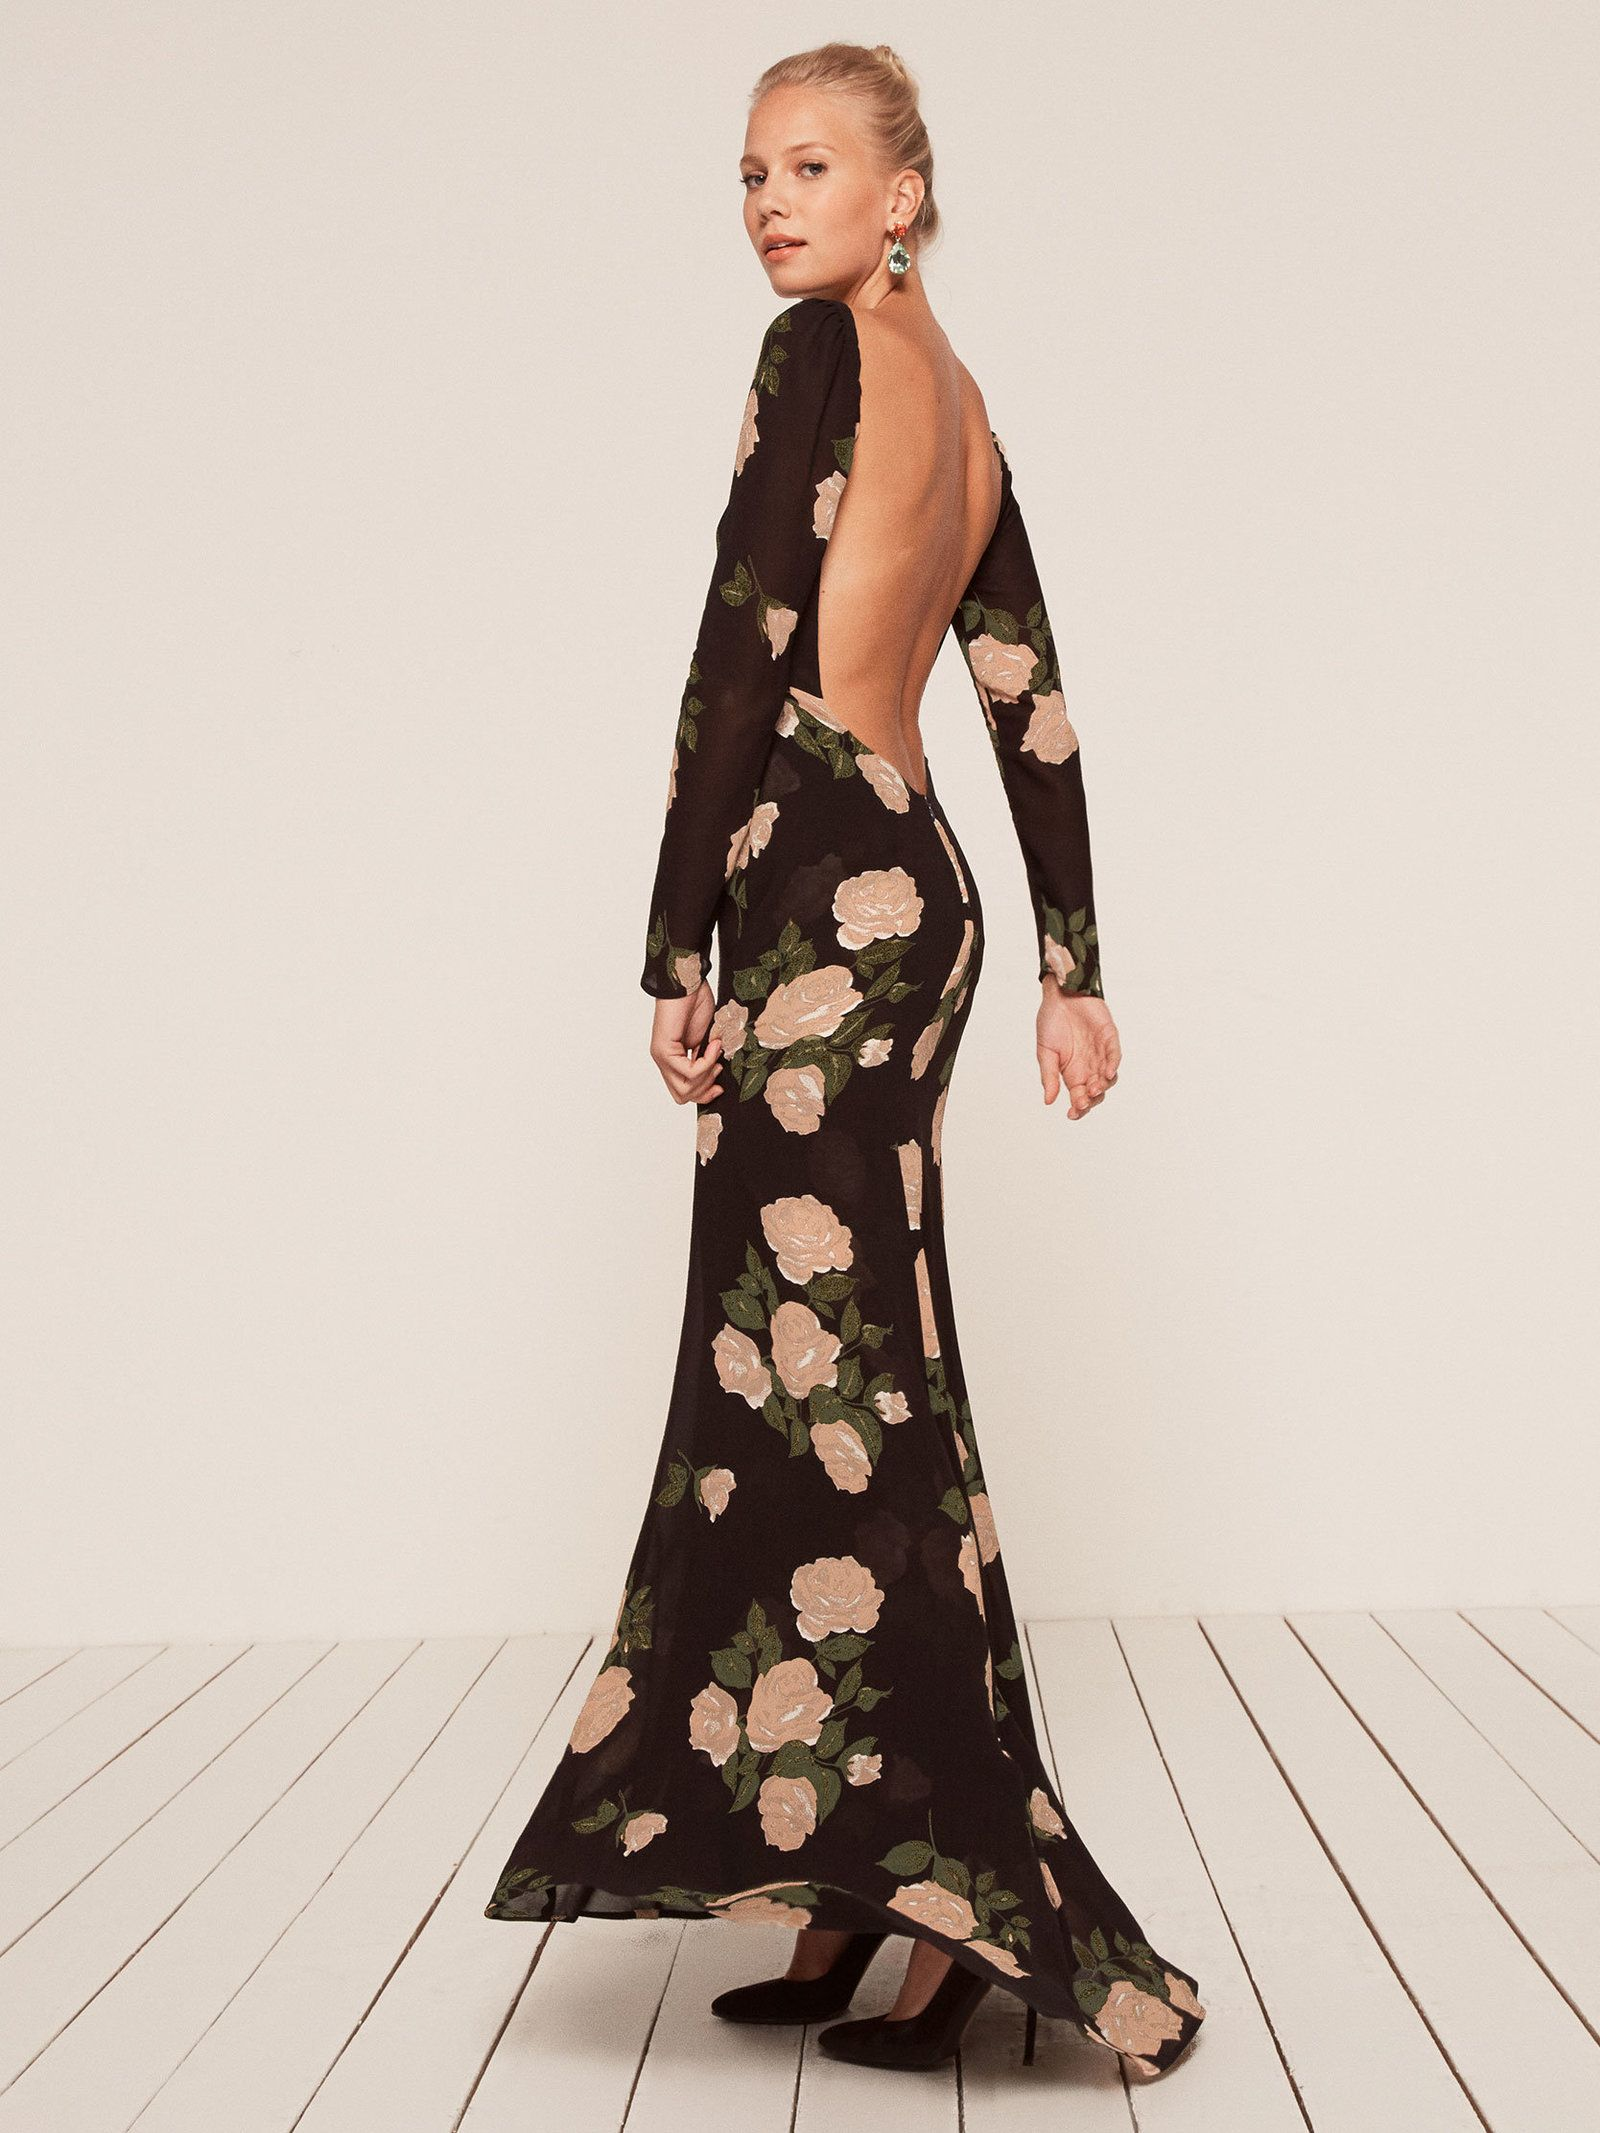 Rome dress maxi dresses pinterest rome floor length dresses